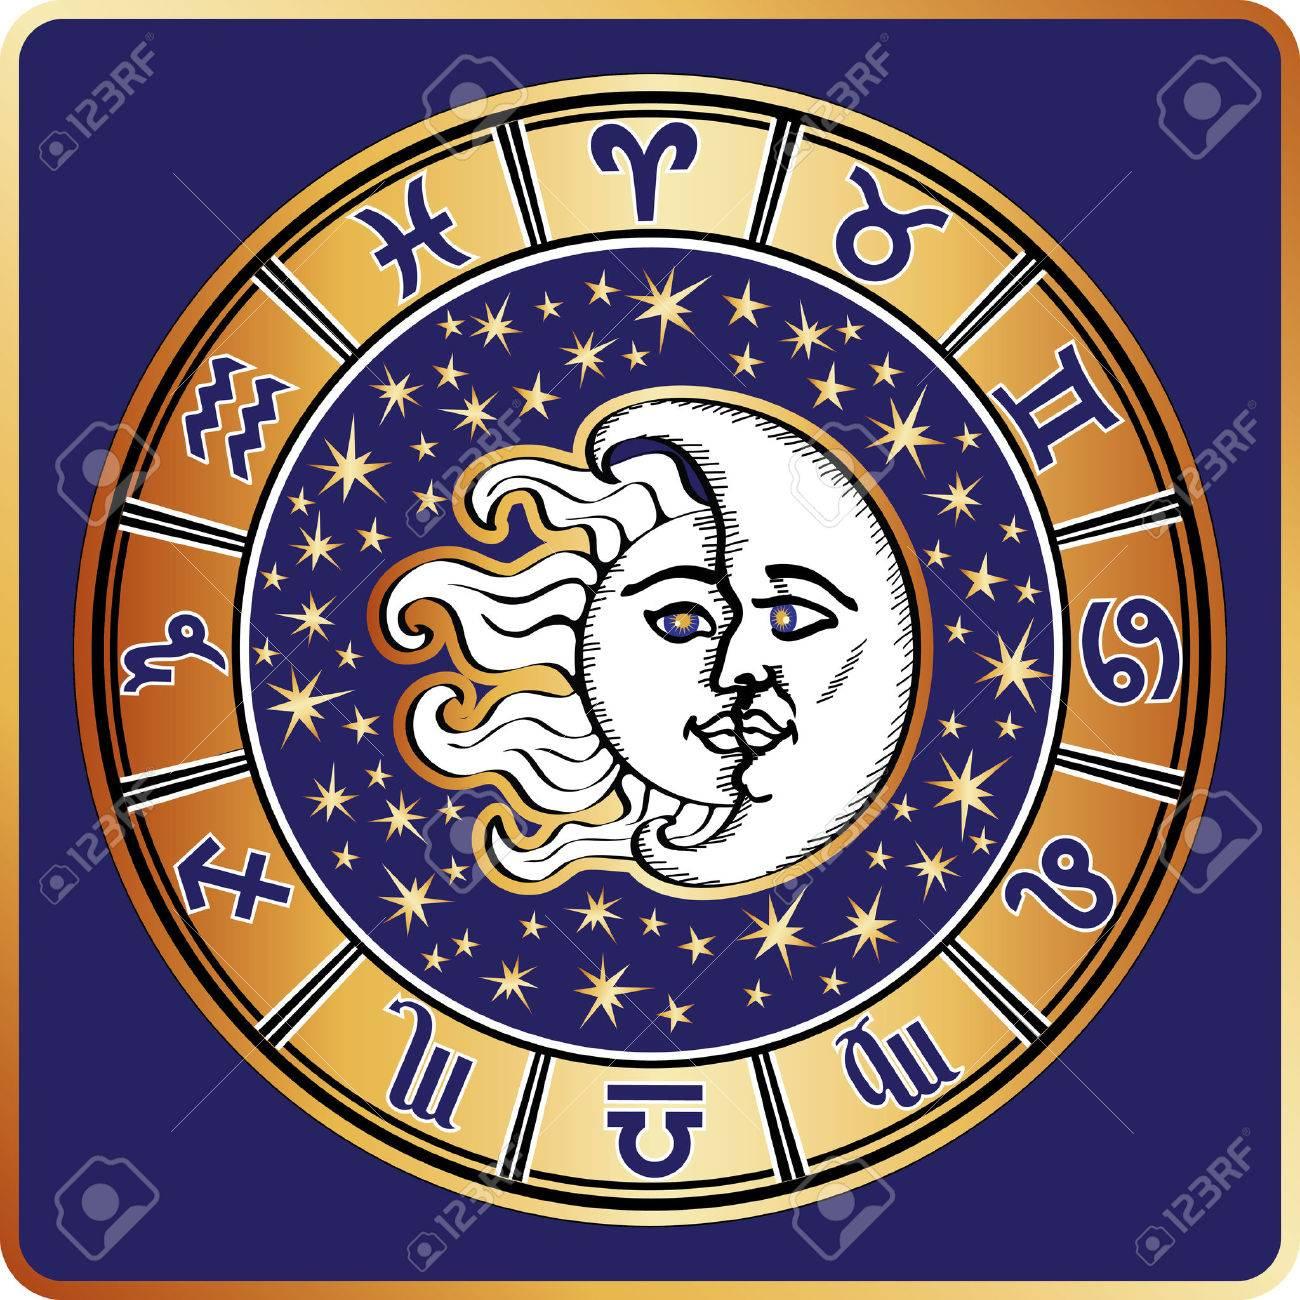 horoscopes sun and moon signs